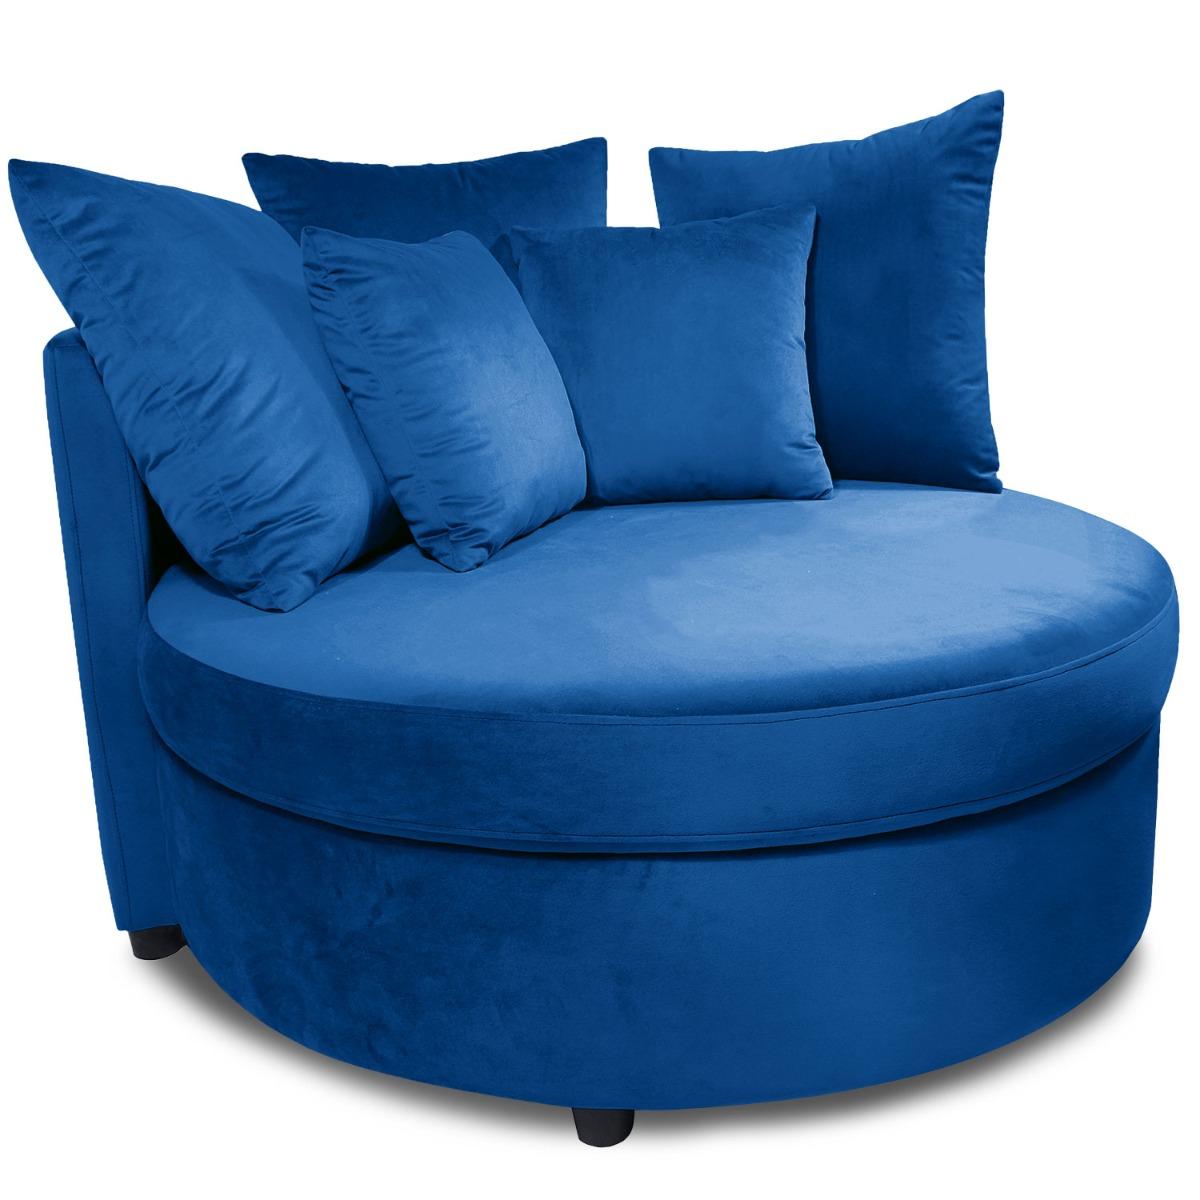 Fauteuil XXL Musso Velours Bleu